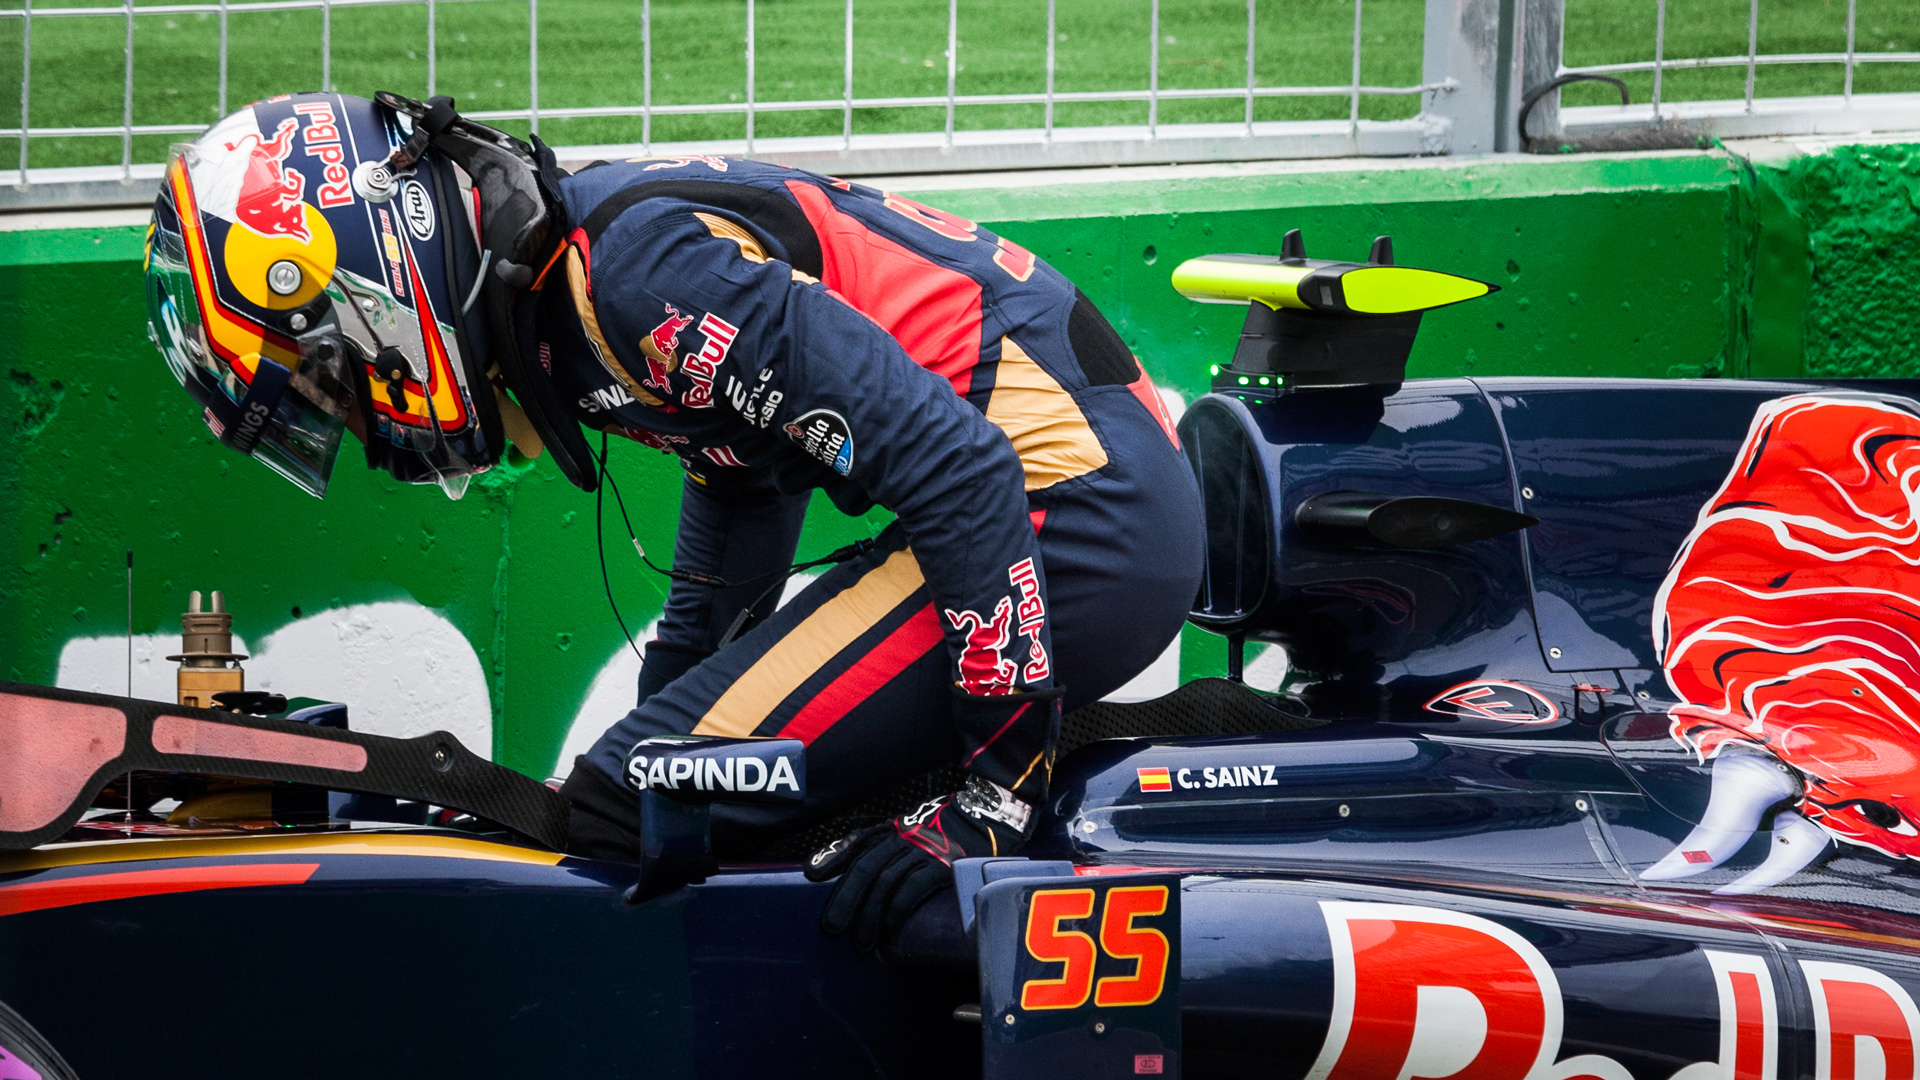 F1 Grand Prix Canada